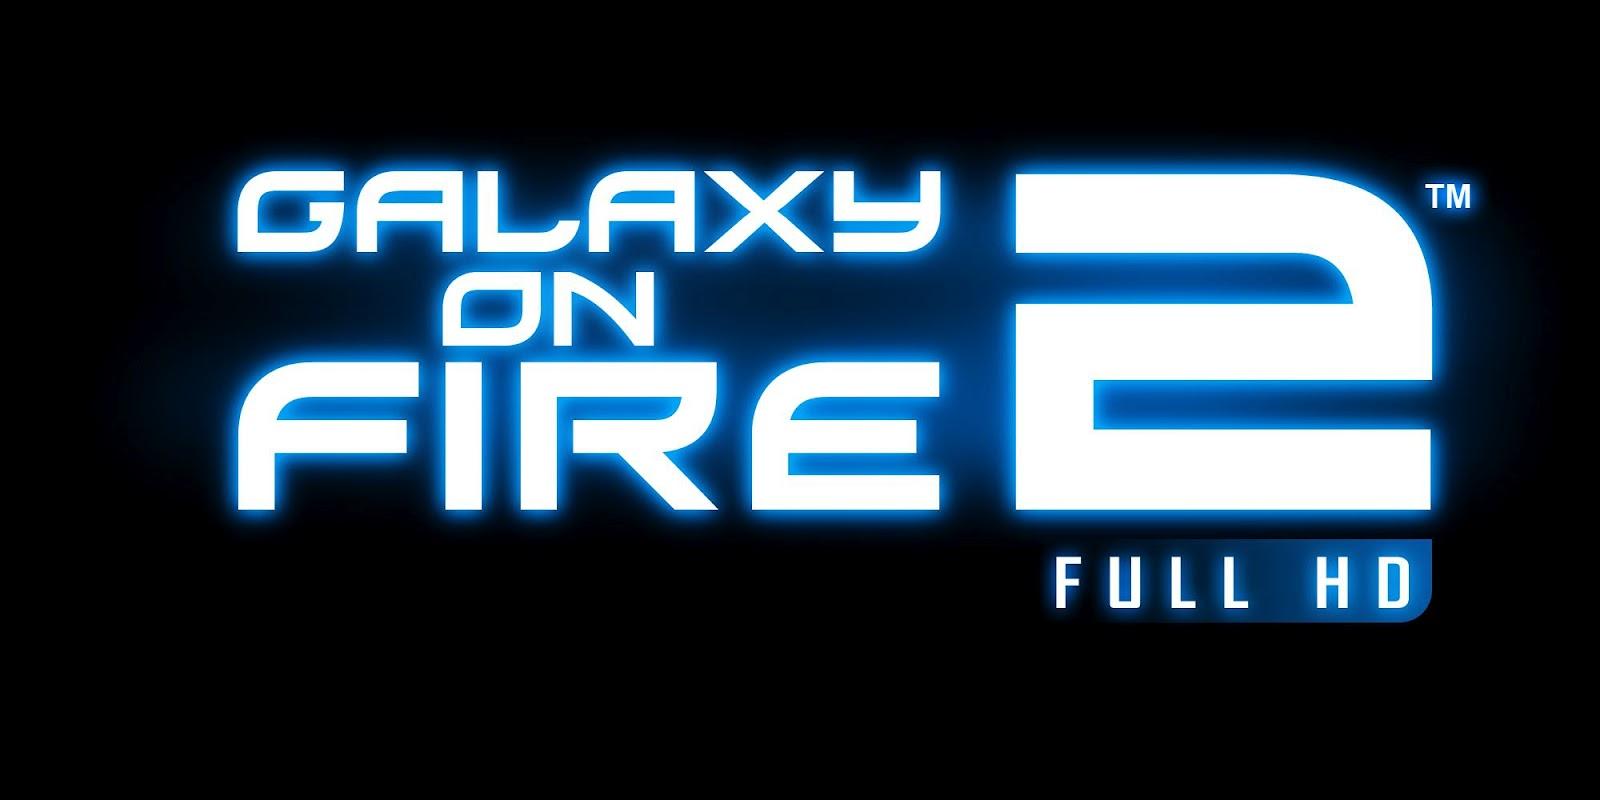 http://1.bp.blogspot.com/-Cpa-SVTiQLo/T_O6fqTMWUI/AAAAAAAABC8/TwXdycE69ok/s1600/galaxy_on_fire_2_logo_full_hd.jpg